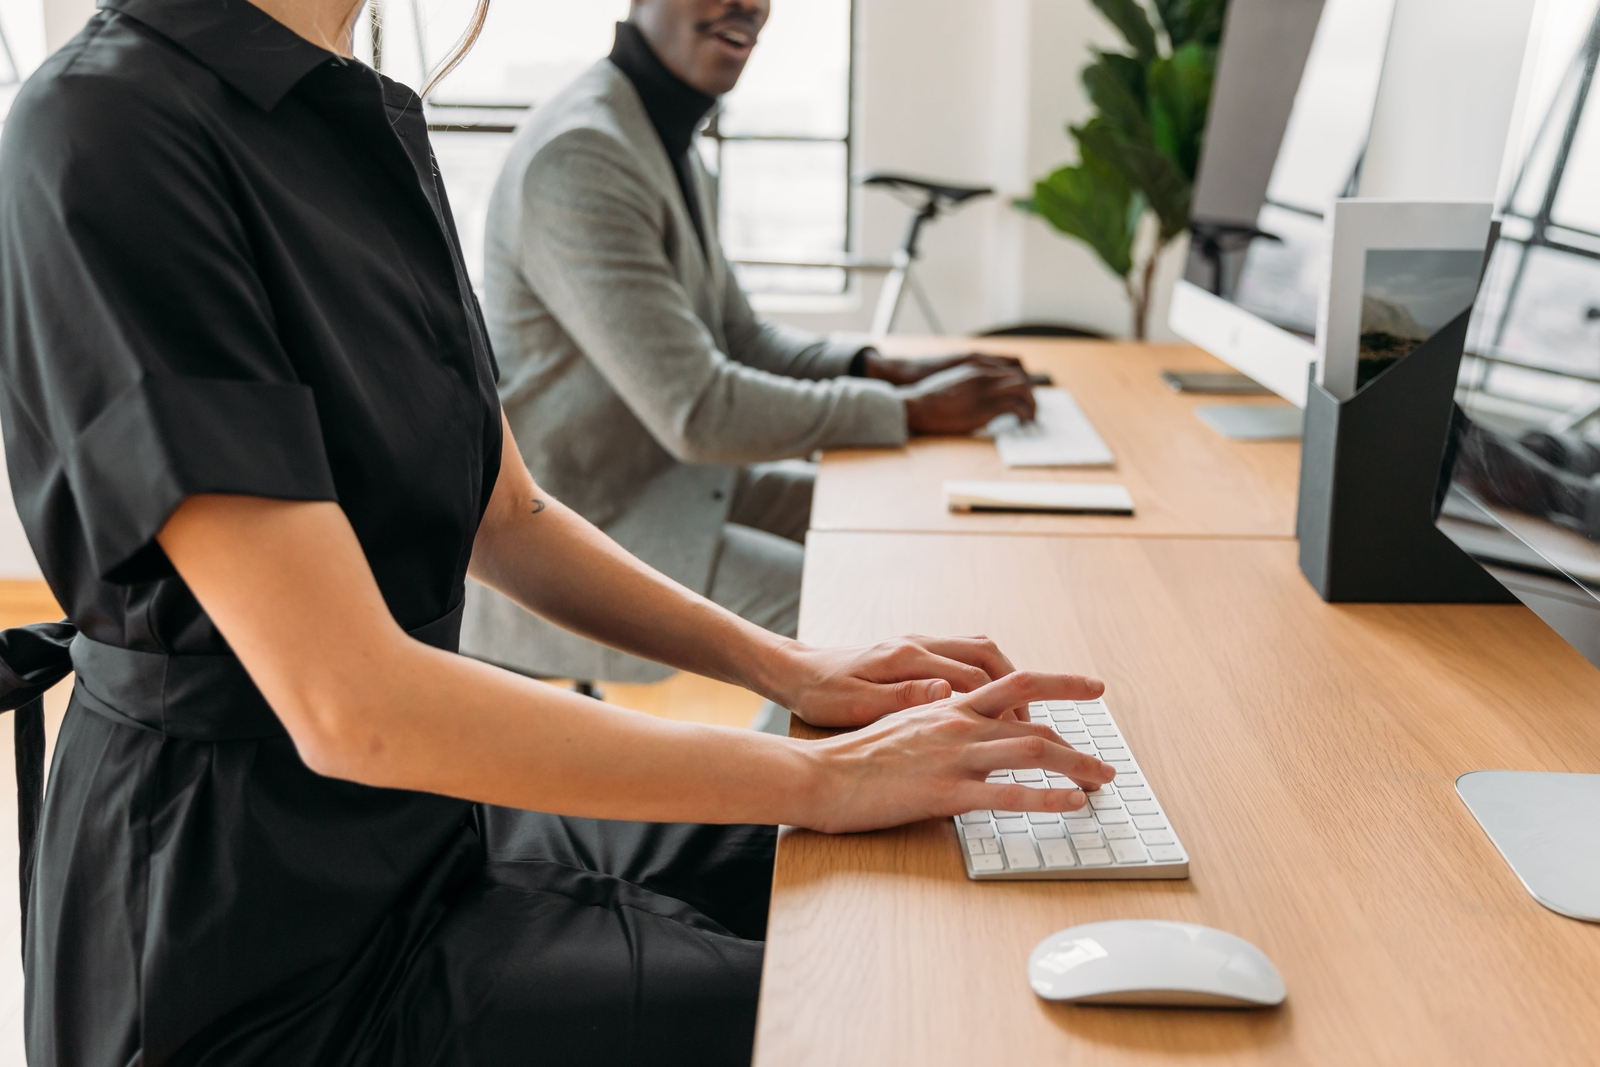 Woman typing at desktop computer